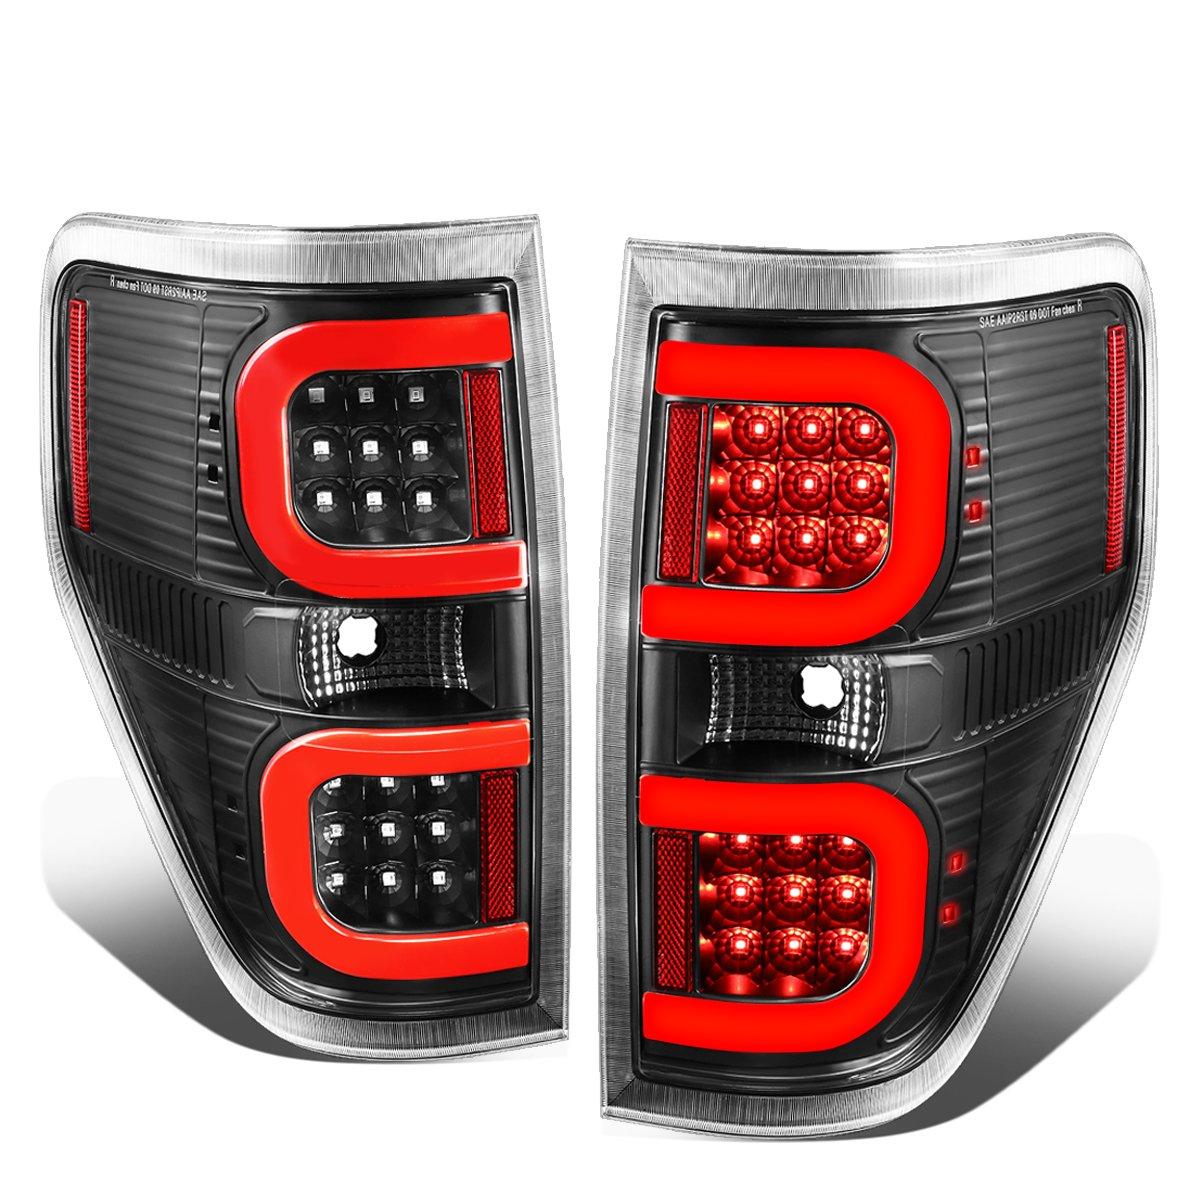 09-14 Ford F150 DNA Motoring TL-F15009-LED-RD3D-BK-CL Dual RED LED C-Bar Tail Light Black//Clear